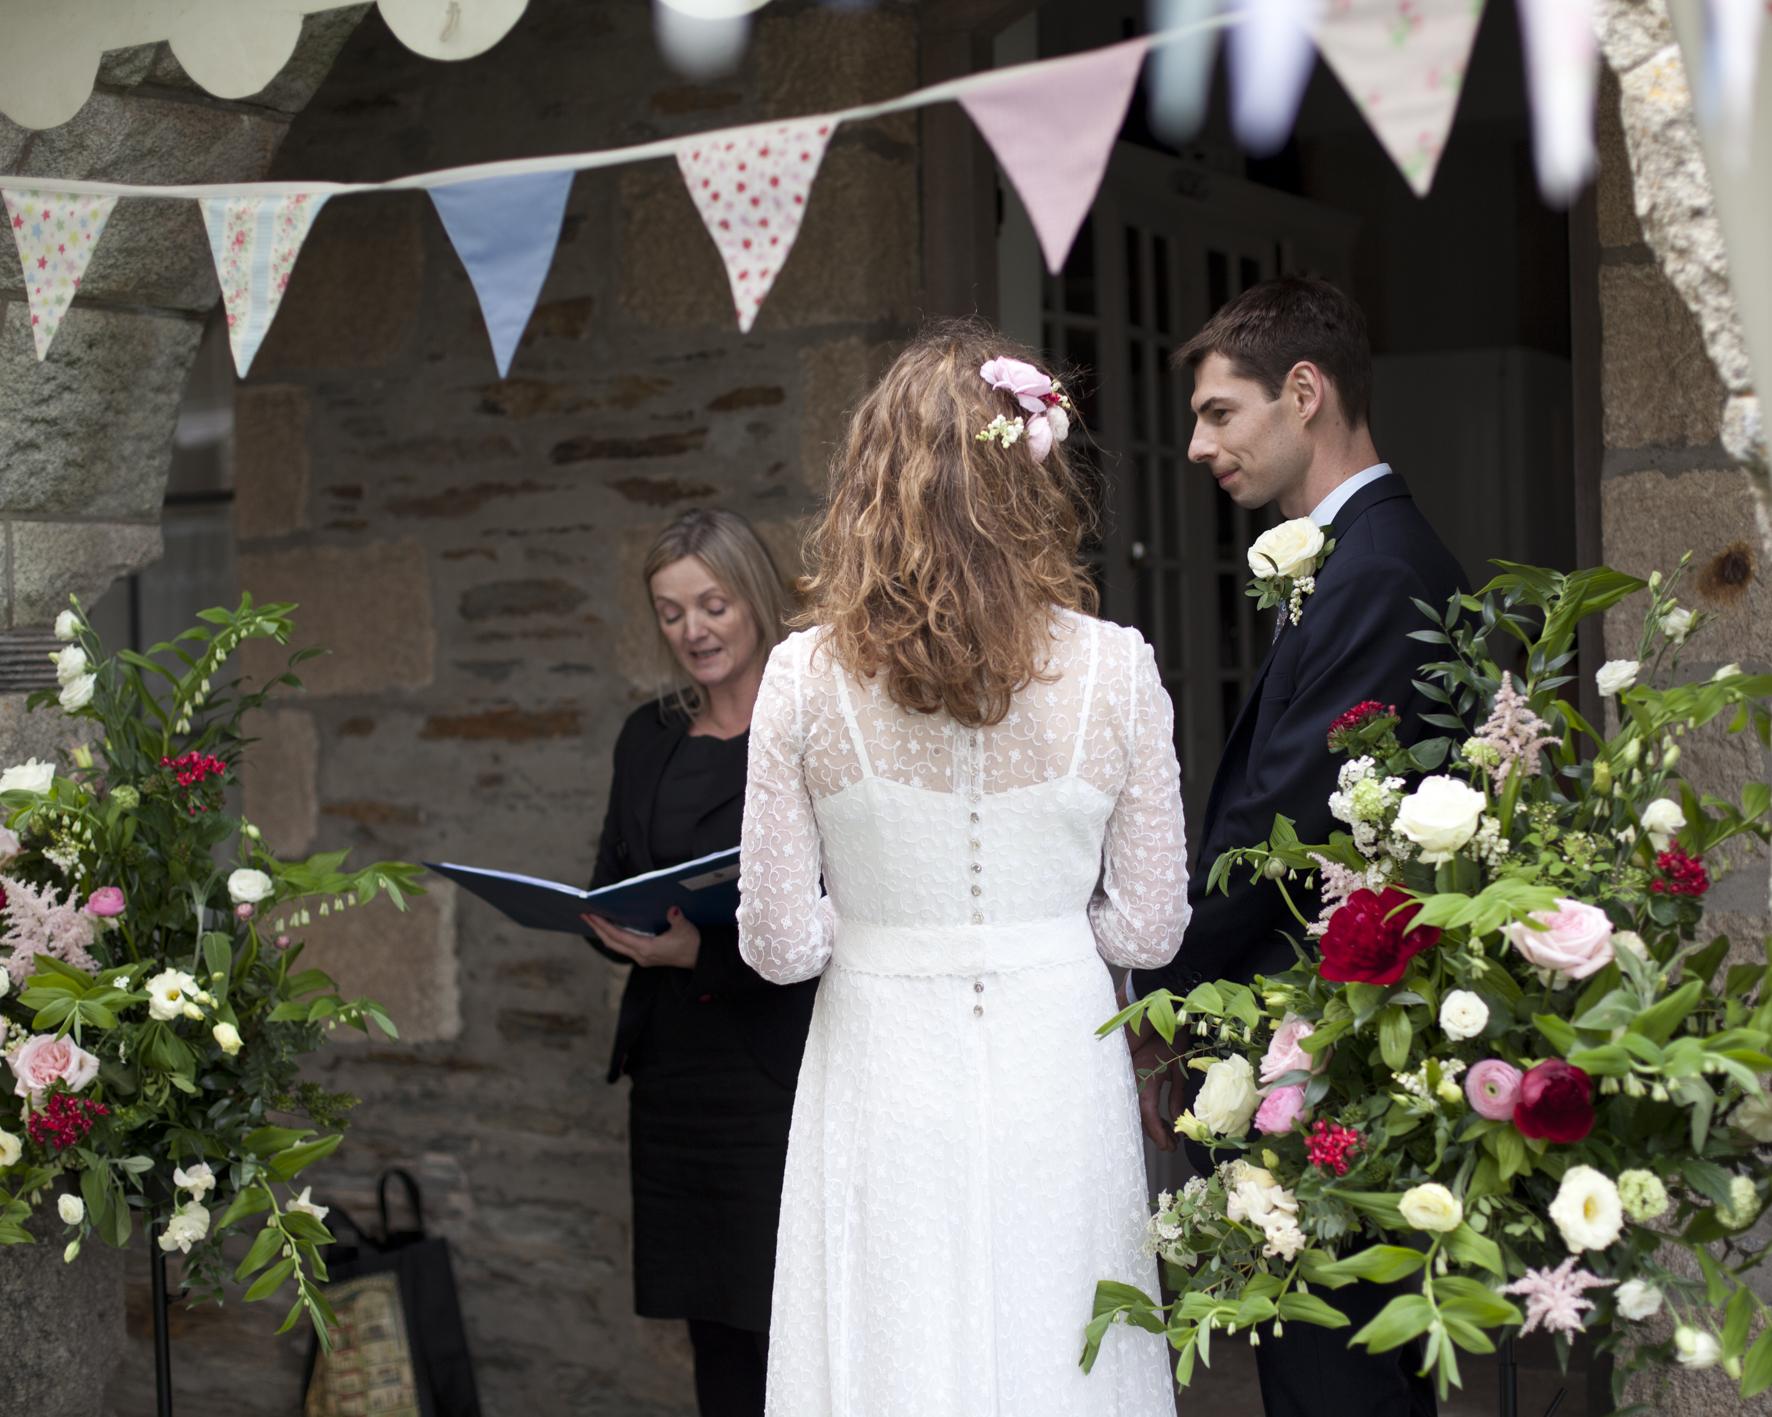 Wedding example_M&P__MG_3333_Claudia Leisinger.jpg